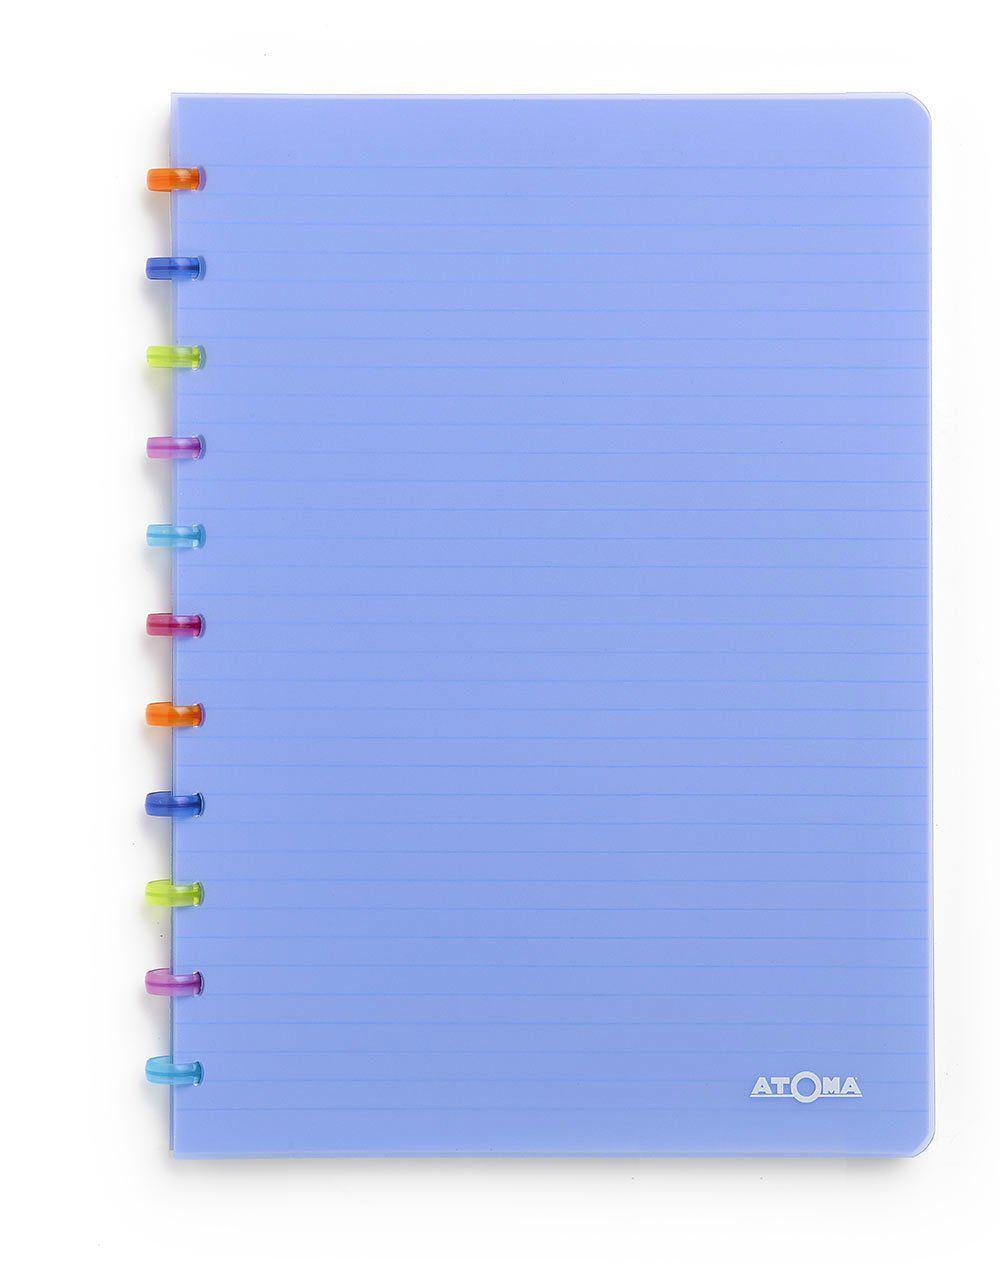 Caderno A4 72 fls azul TUTTI FRUTI Atoma